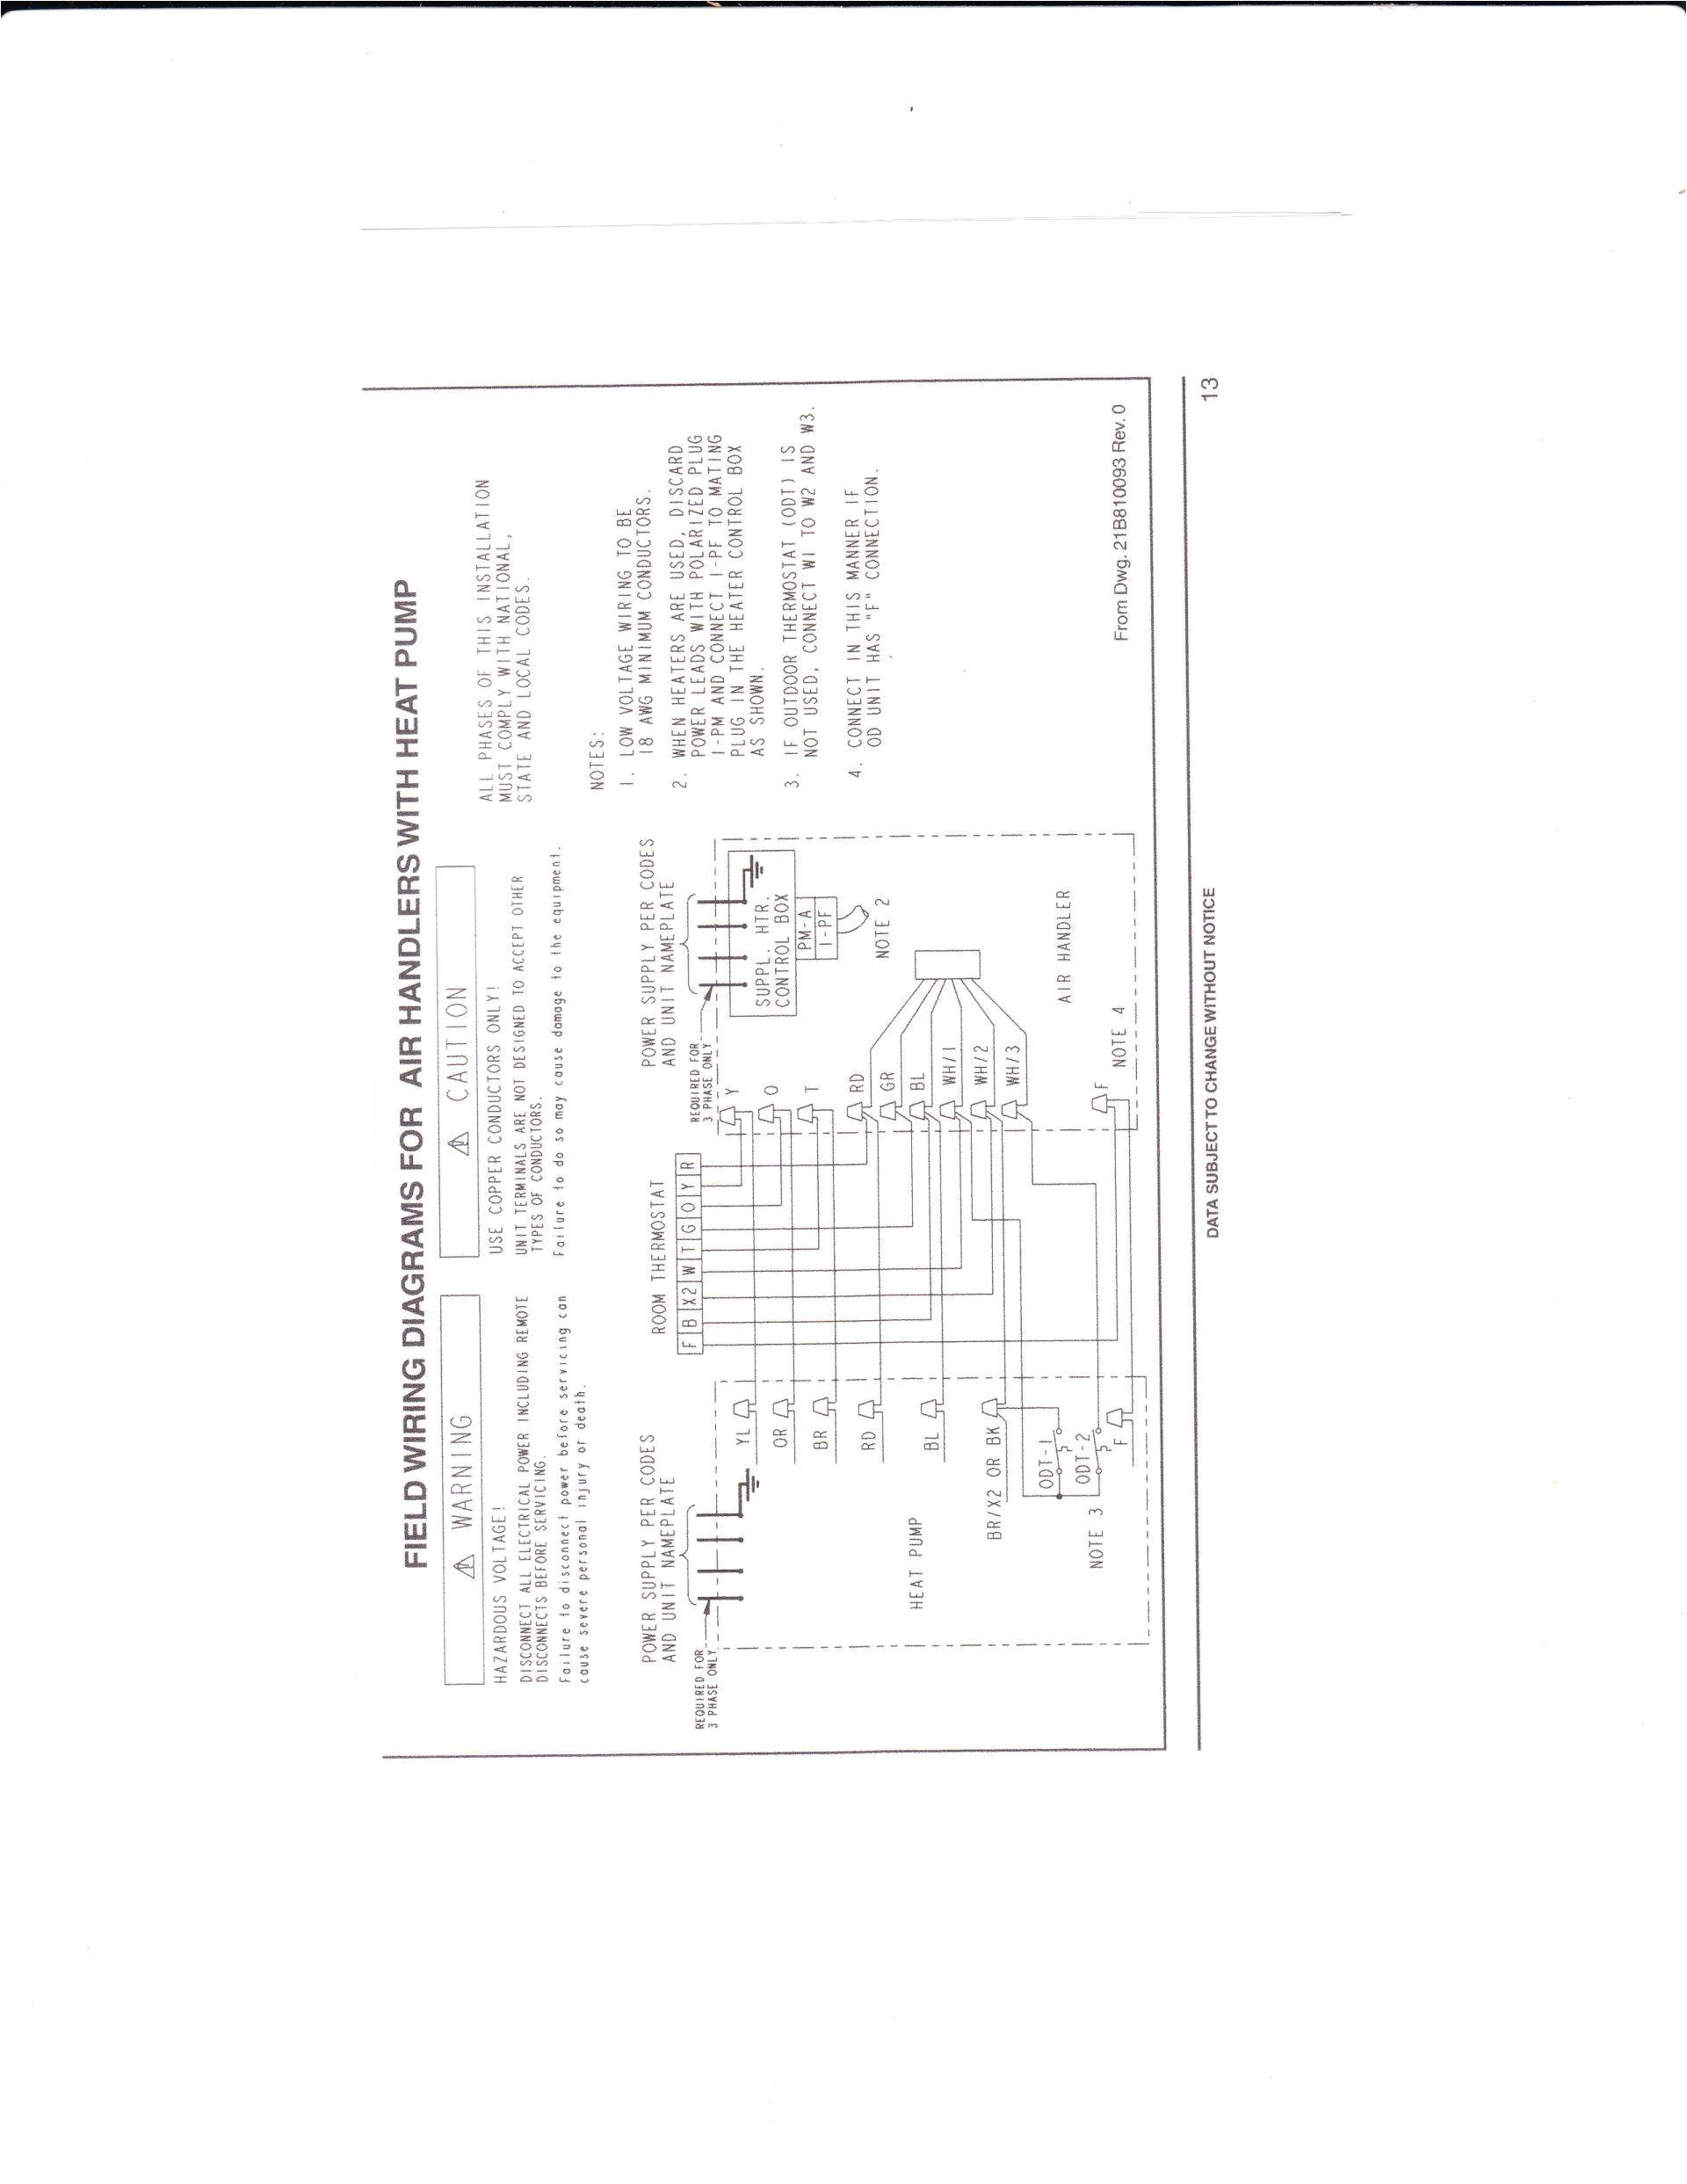 load center wiring diagram wiring diagram databasehomeline load center wiring diagram